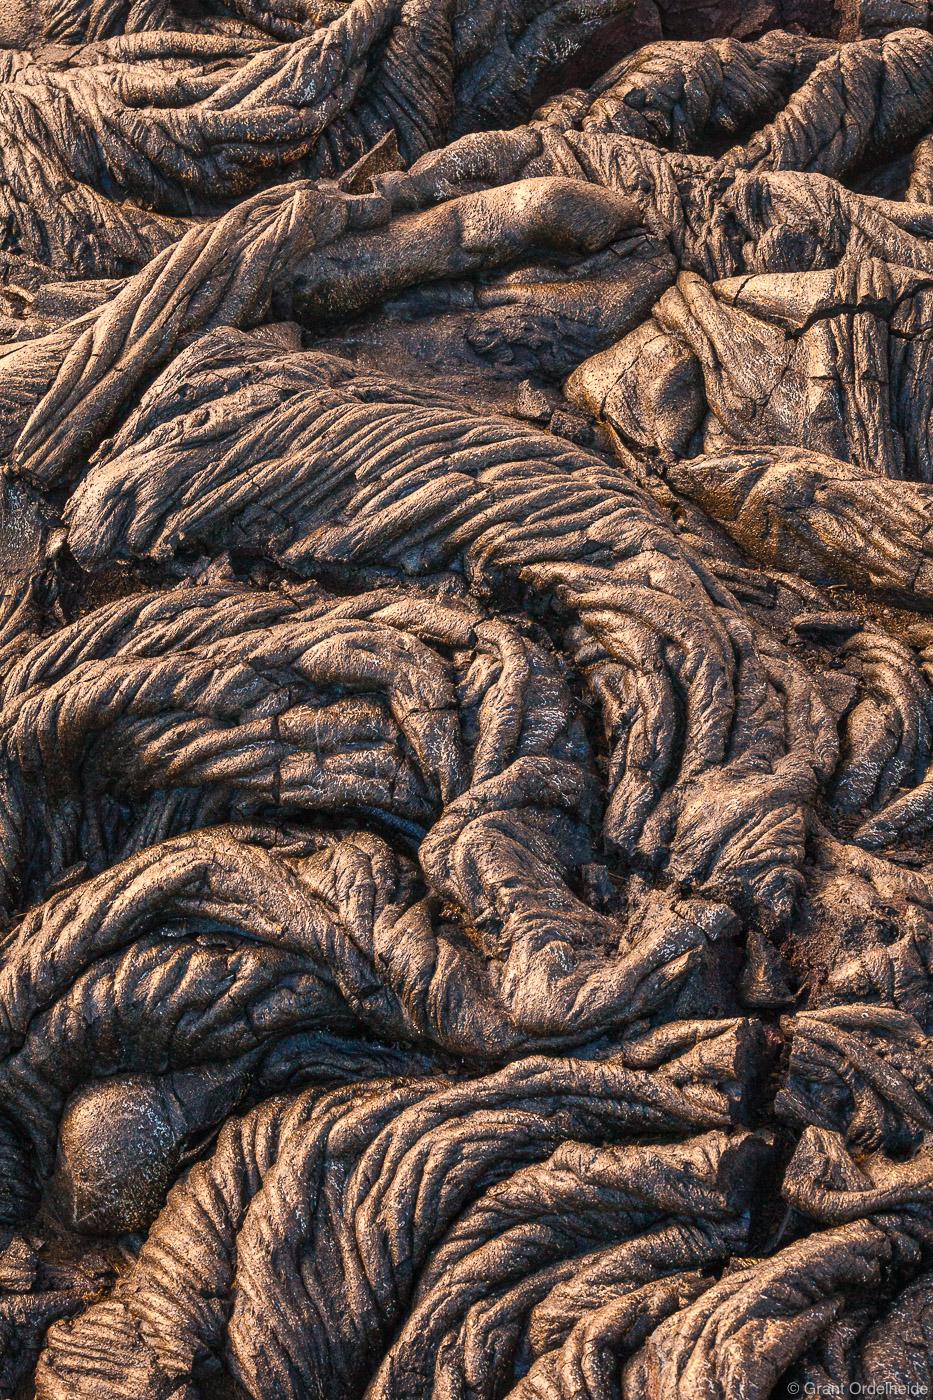 lava, textures, volcanoes, national park, big island, hawaii, cooled, patterns, flow, fields, park, photo